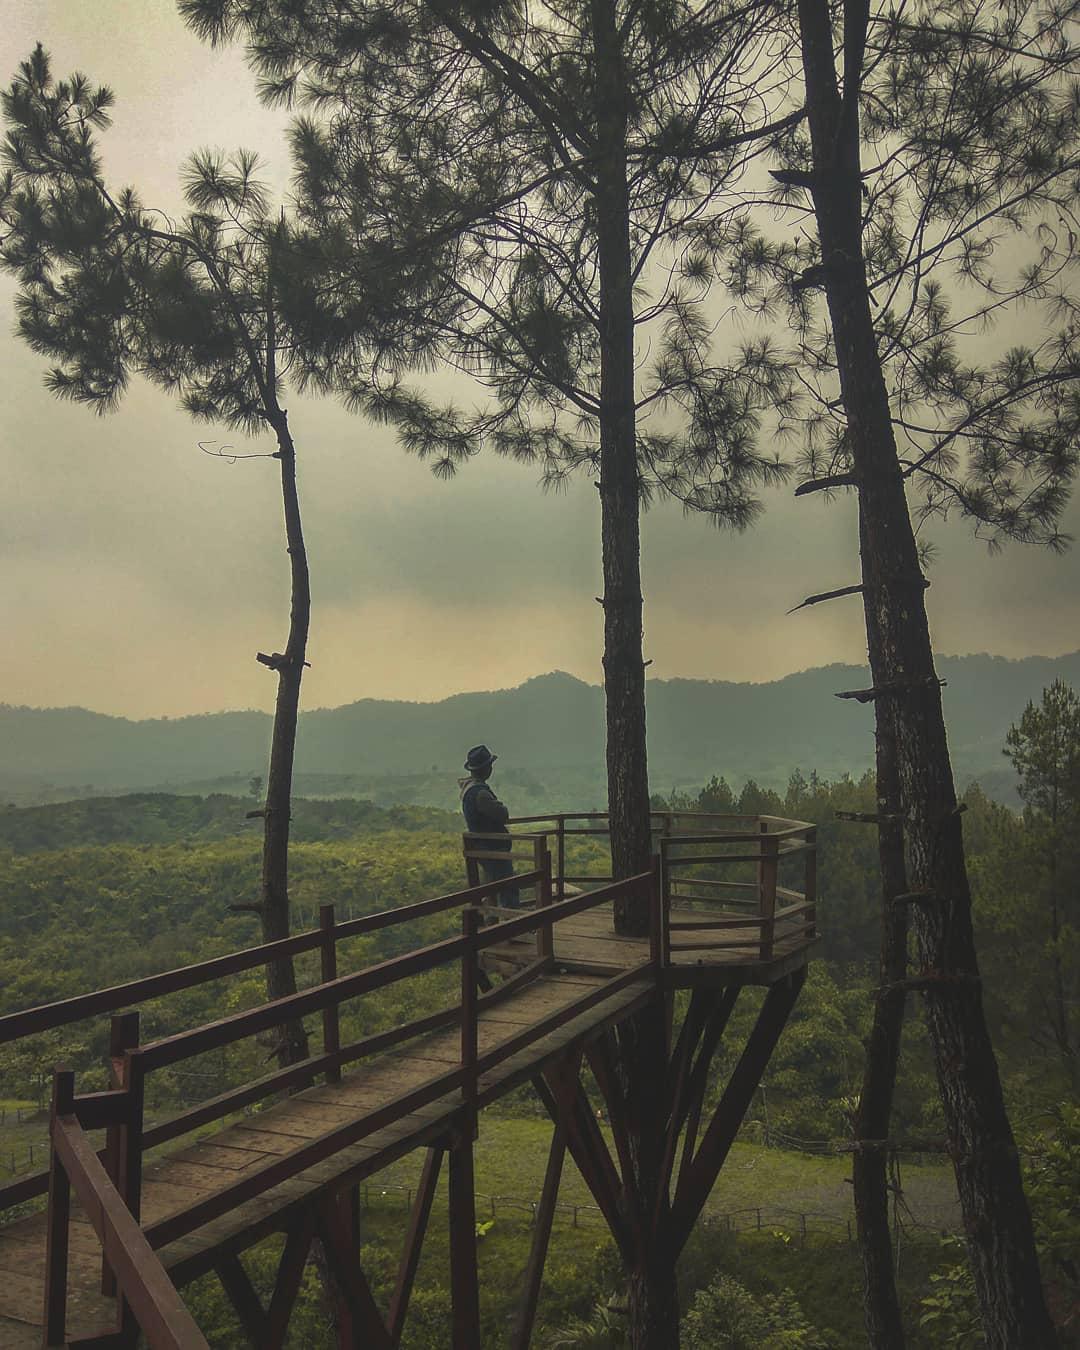 Wisata Alam Bakukung Cianten Bogor nan Sejuk - Destinasi Wisata